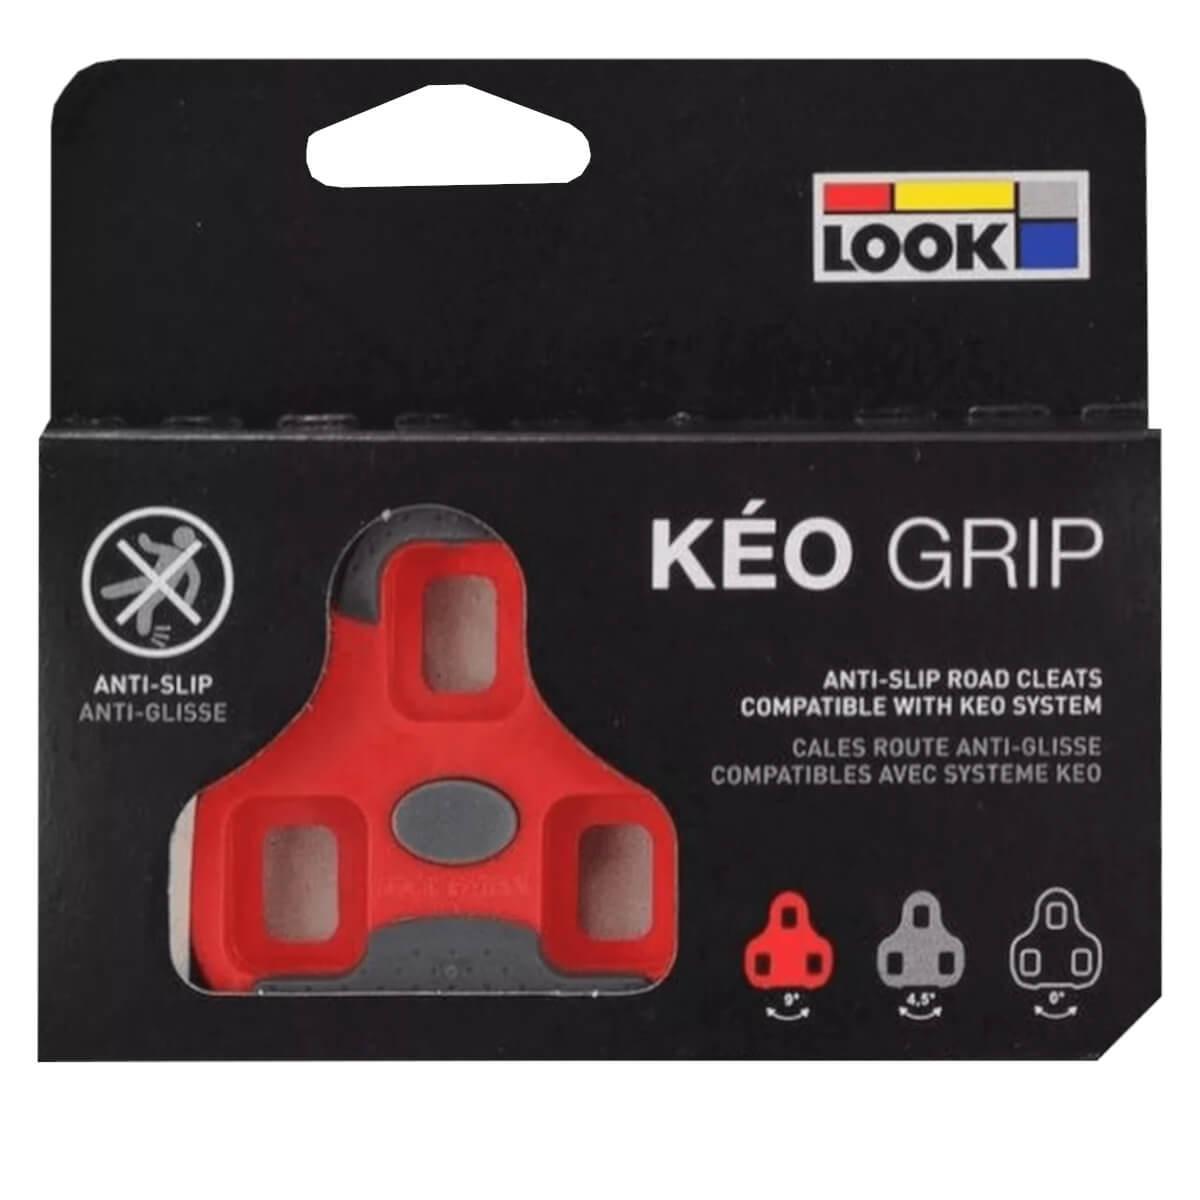 Taco Look Kéo Grip Vermelho Float 9 Graus Speed Anti Slip